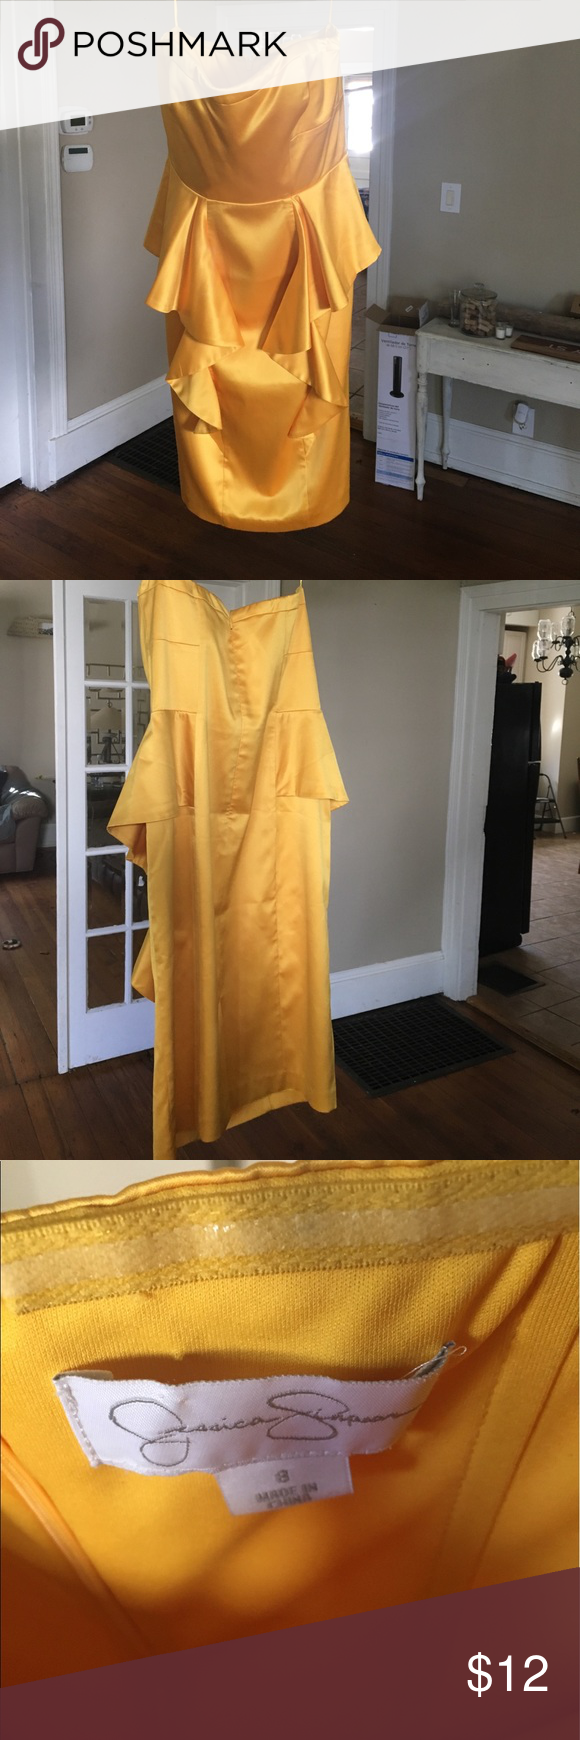 Jessica simpson yellow cocktail dress